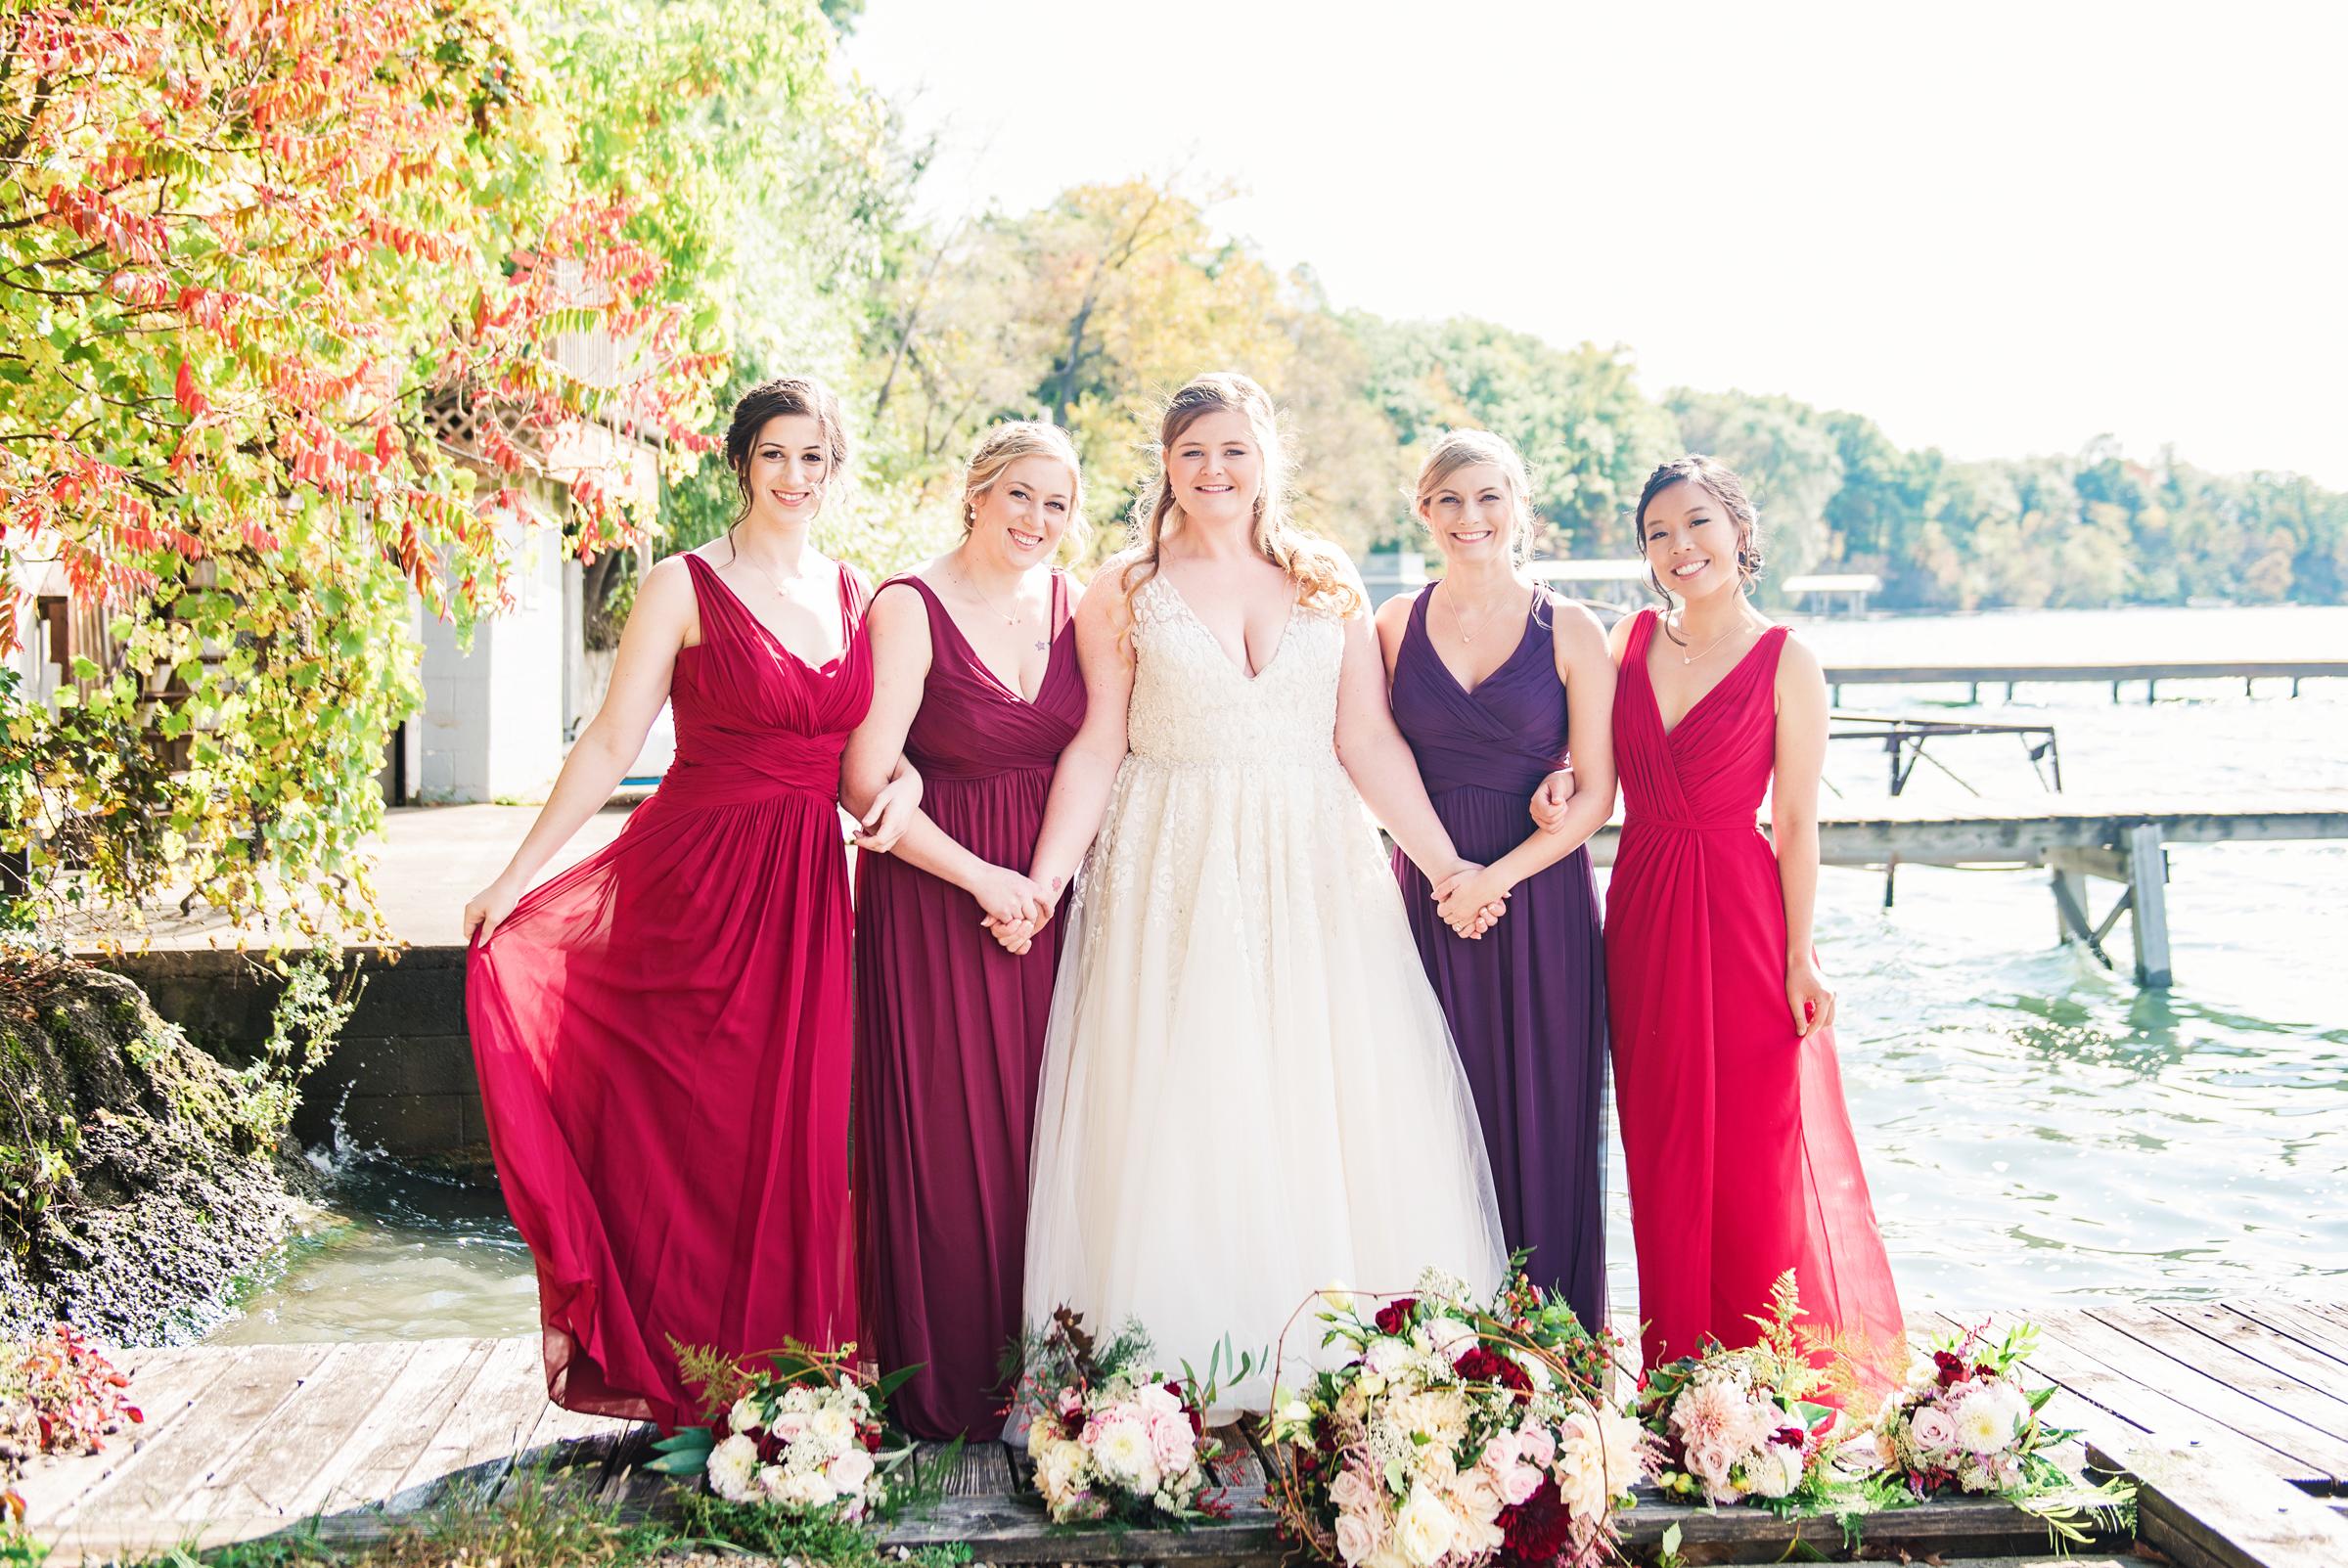 Zugibe_Vineyards_Finger_Lakes_Wedding_JILL_STUDIO_Rochester_NY_Photographer_DSC_3304.jpg